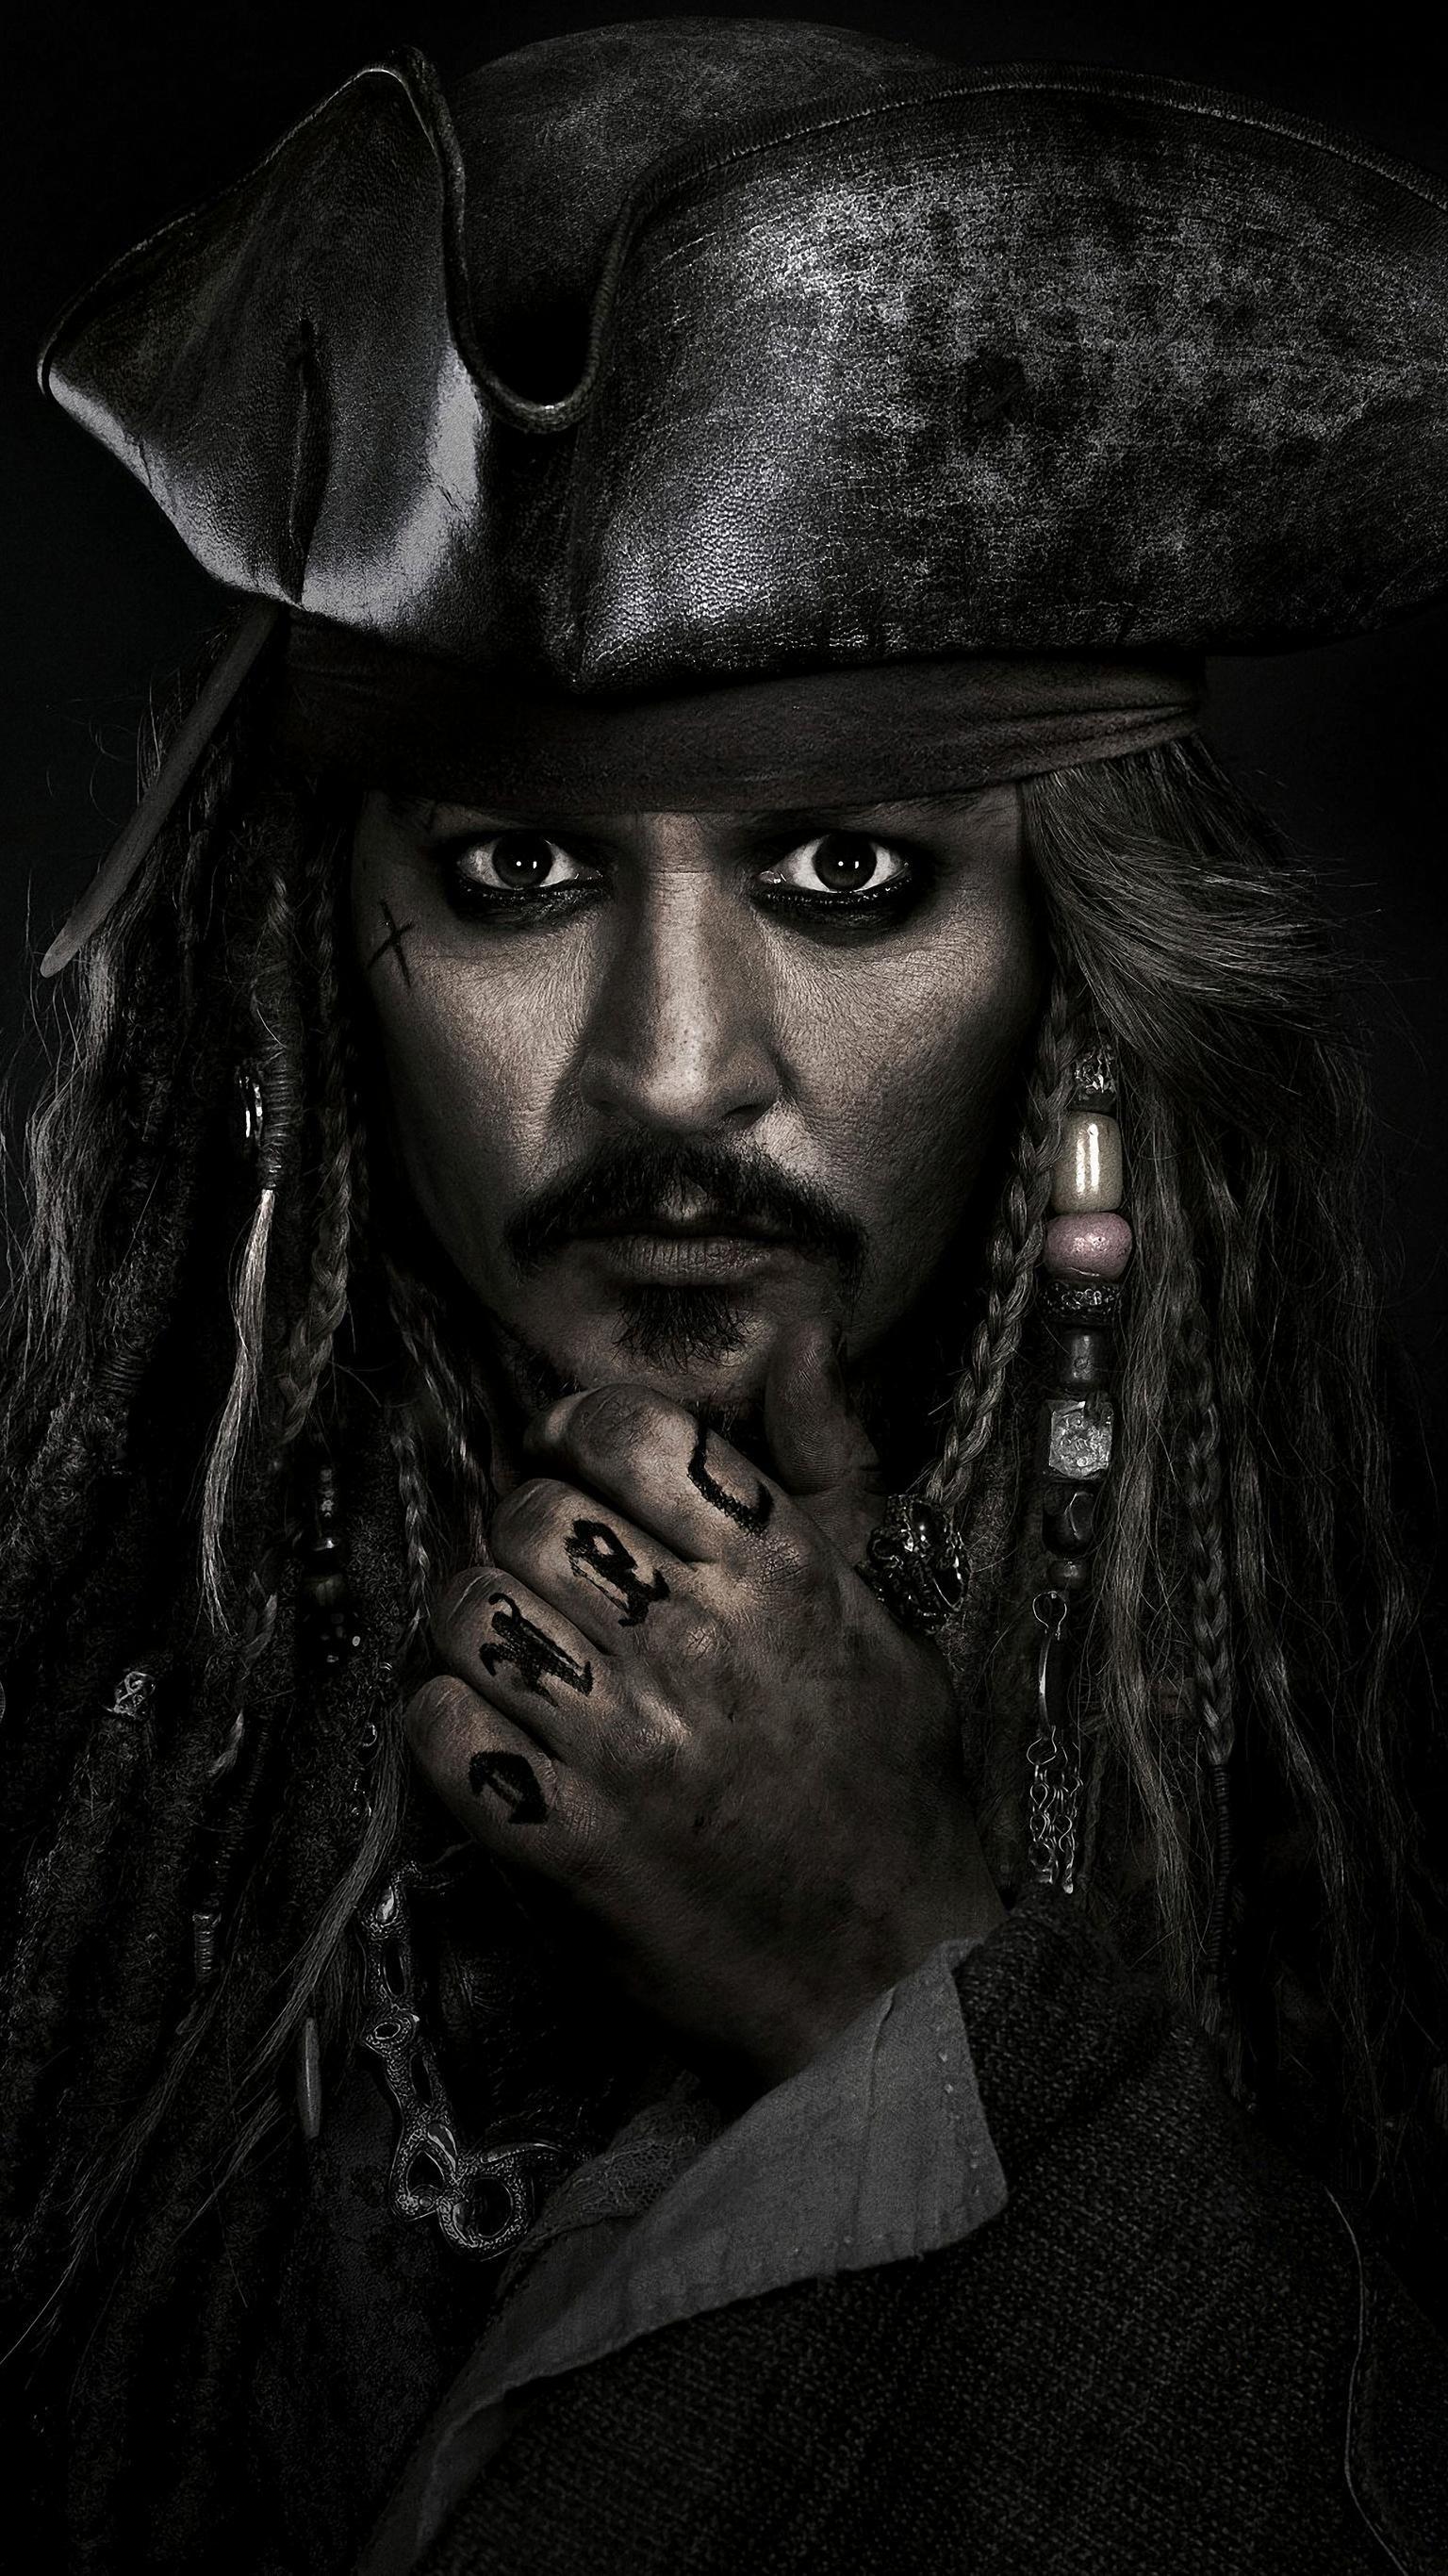 Pirates Of The Caribbean Dead Men Tell No Tales 2017 Phone Wallpaper Moviemania Jack Sparrow Wallpaper Jack Sparrow Tattoos Jack Sparrow